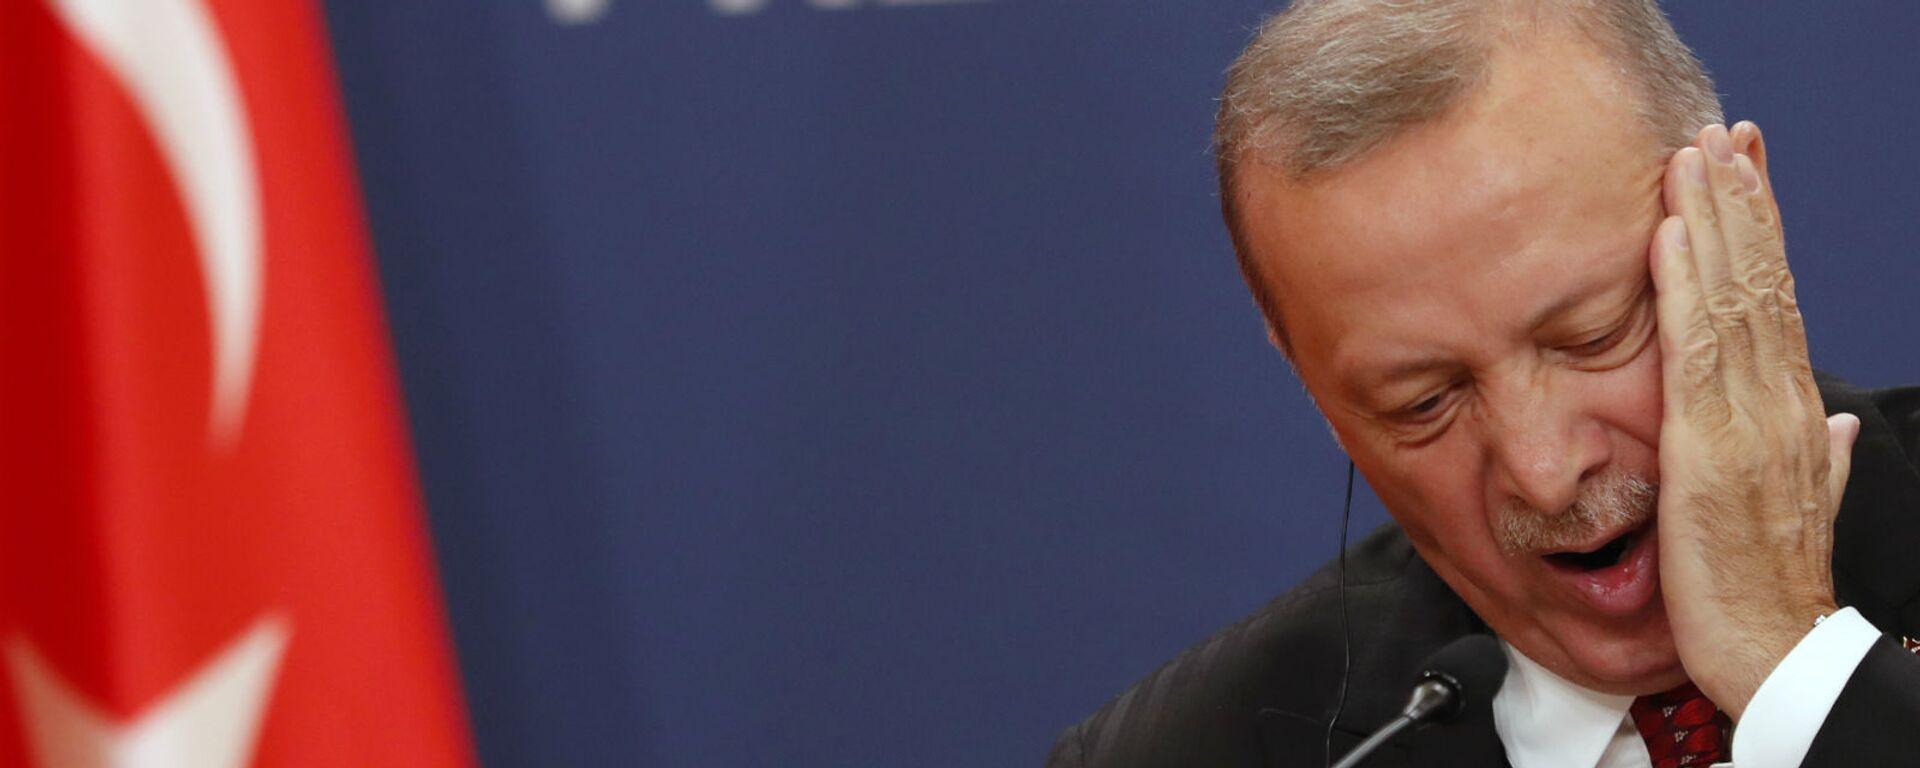 Президент Турции Реджеп Тайип Эрдоган на пресс-конференции (7 октября 2019). Белград, Сербия - Sputnik Армения, 1920, 10.09.2021